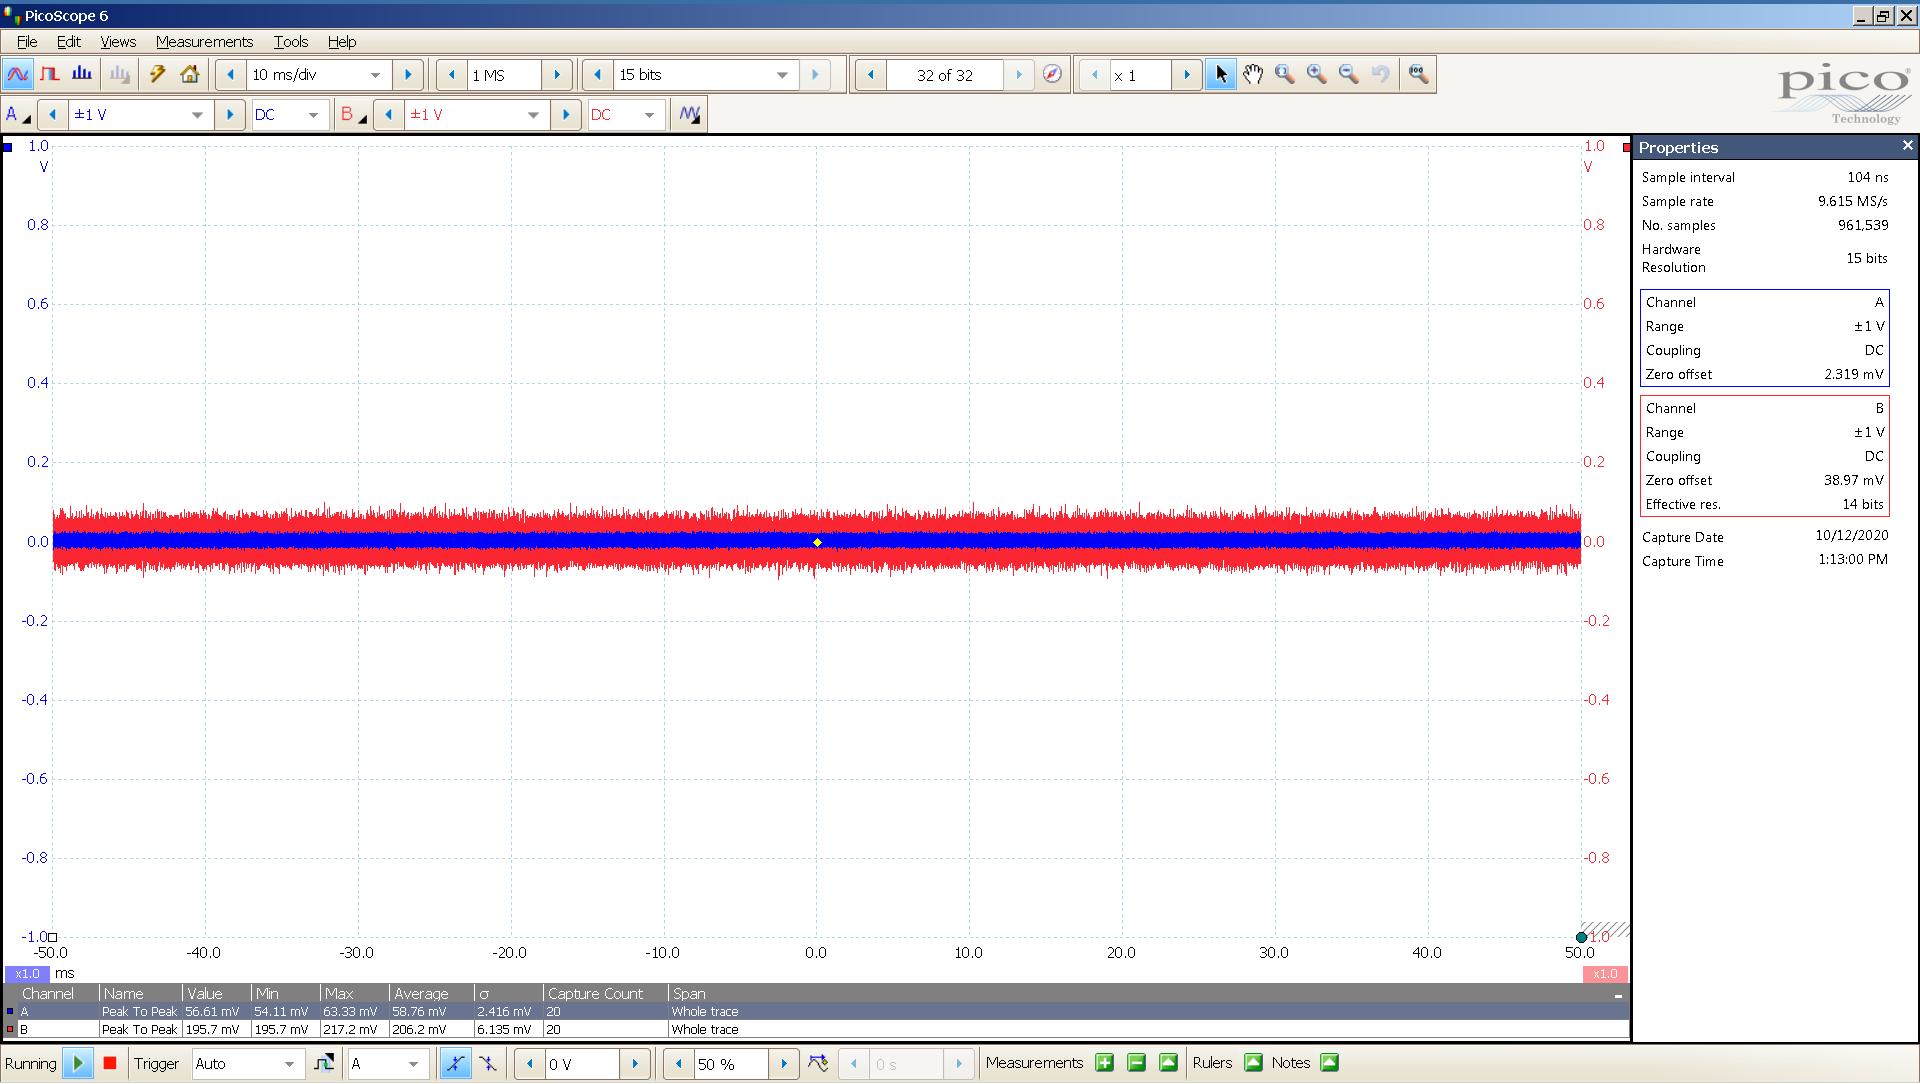 20201012 CT2593-210x  ch A  DP10013 50x ch B 50R input.png